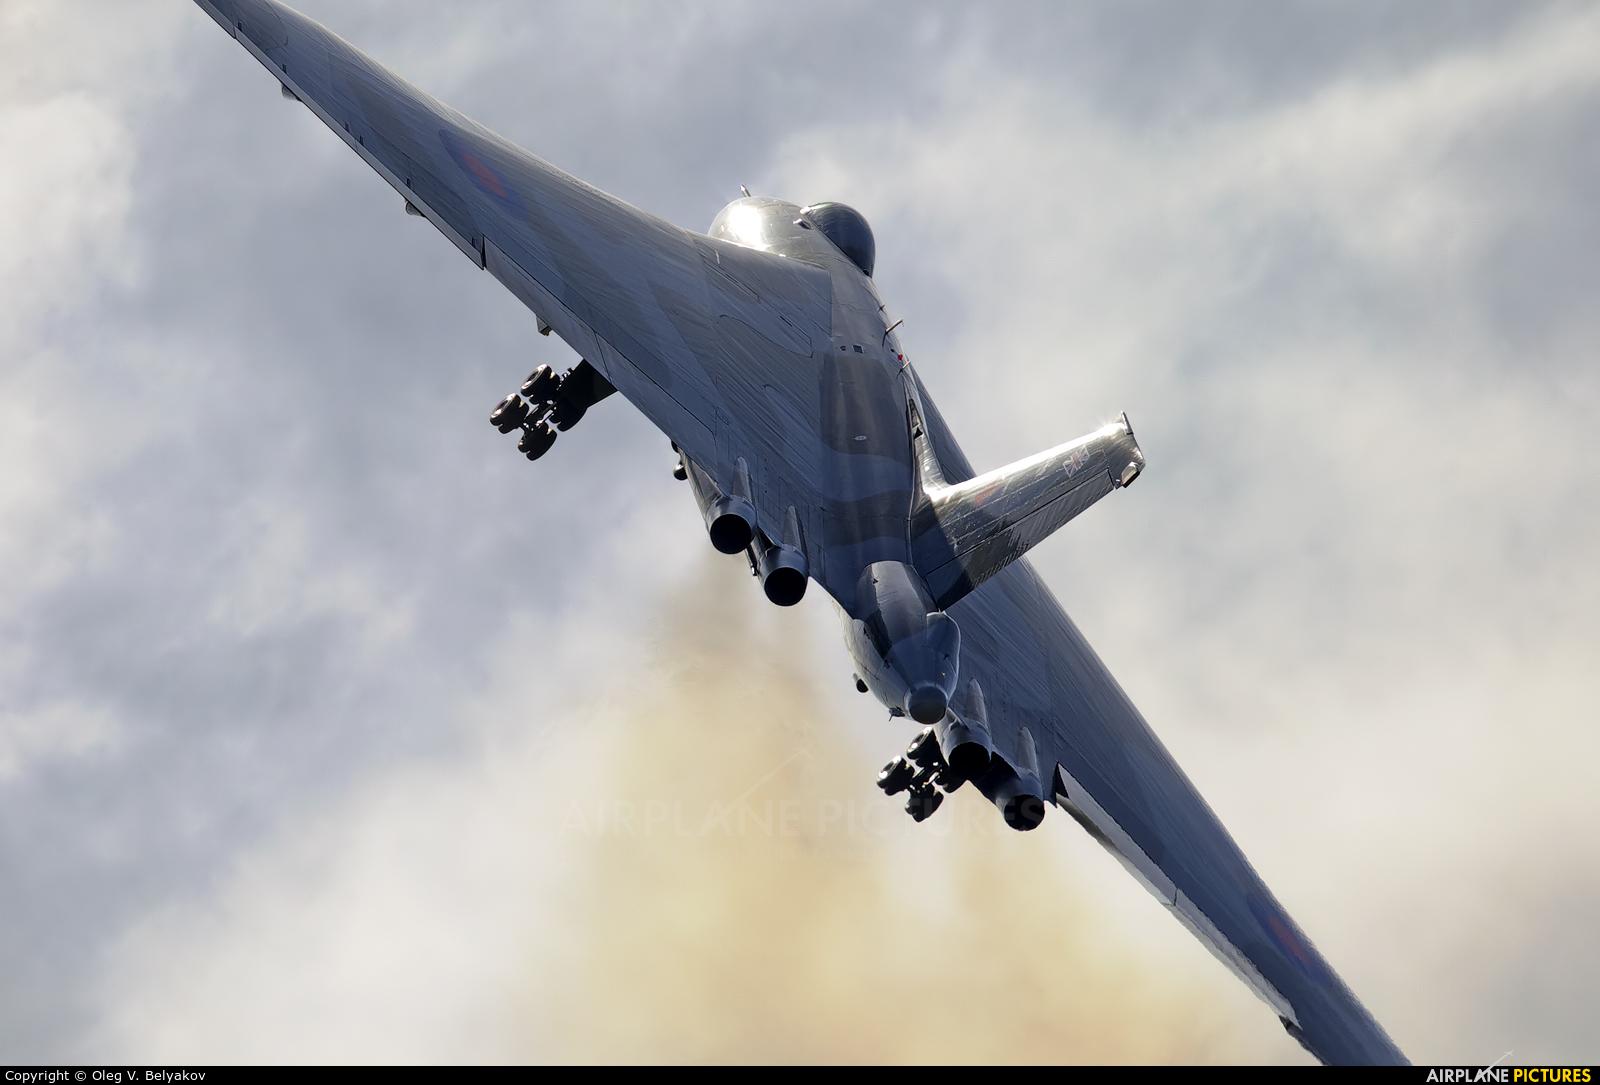 Vulcan to the Sky Trust XH558 aircraft at Farnborough